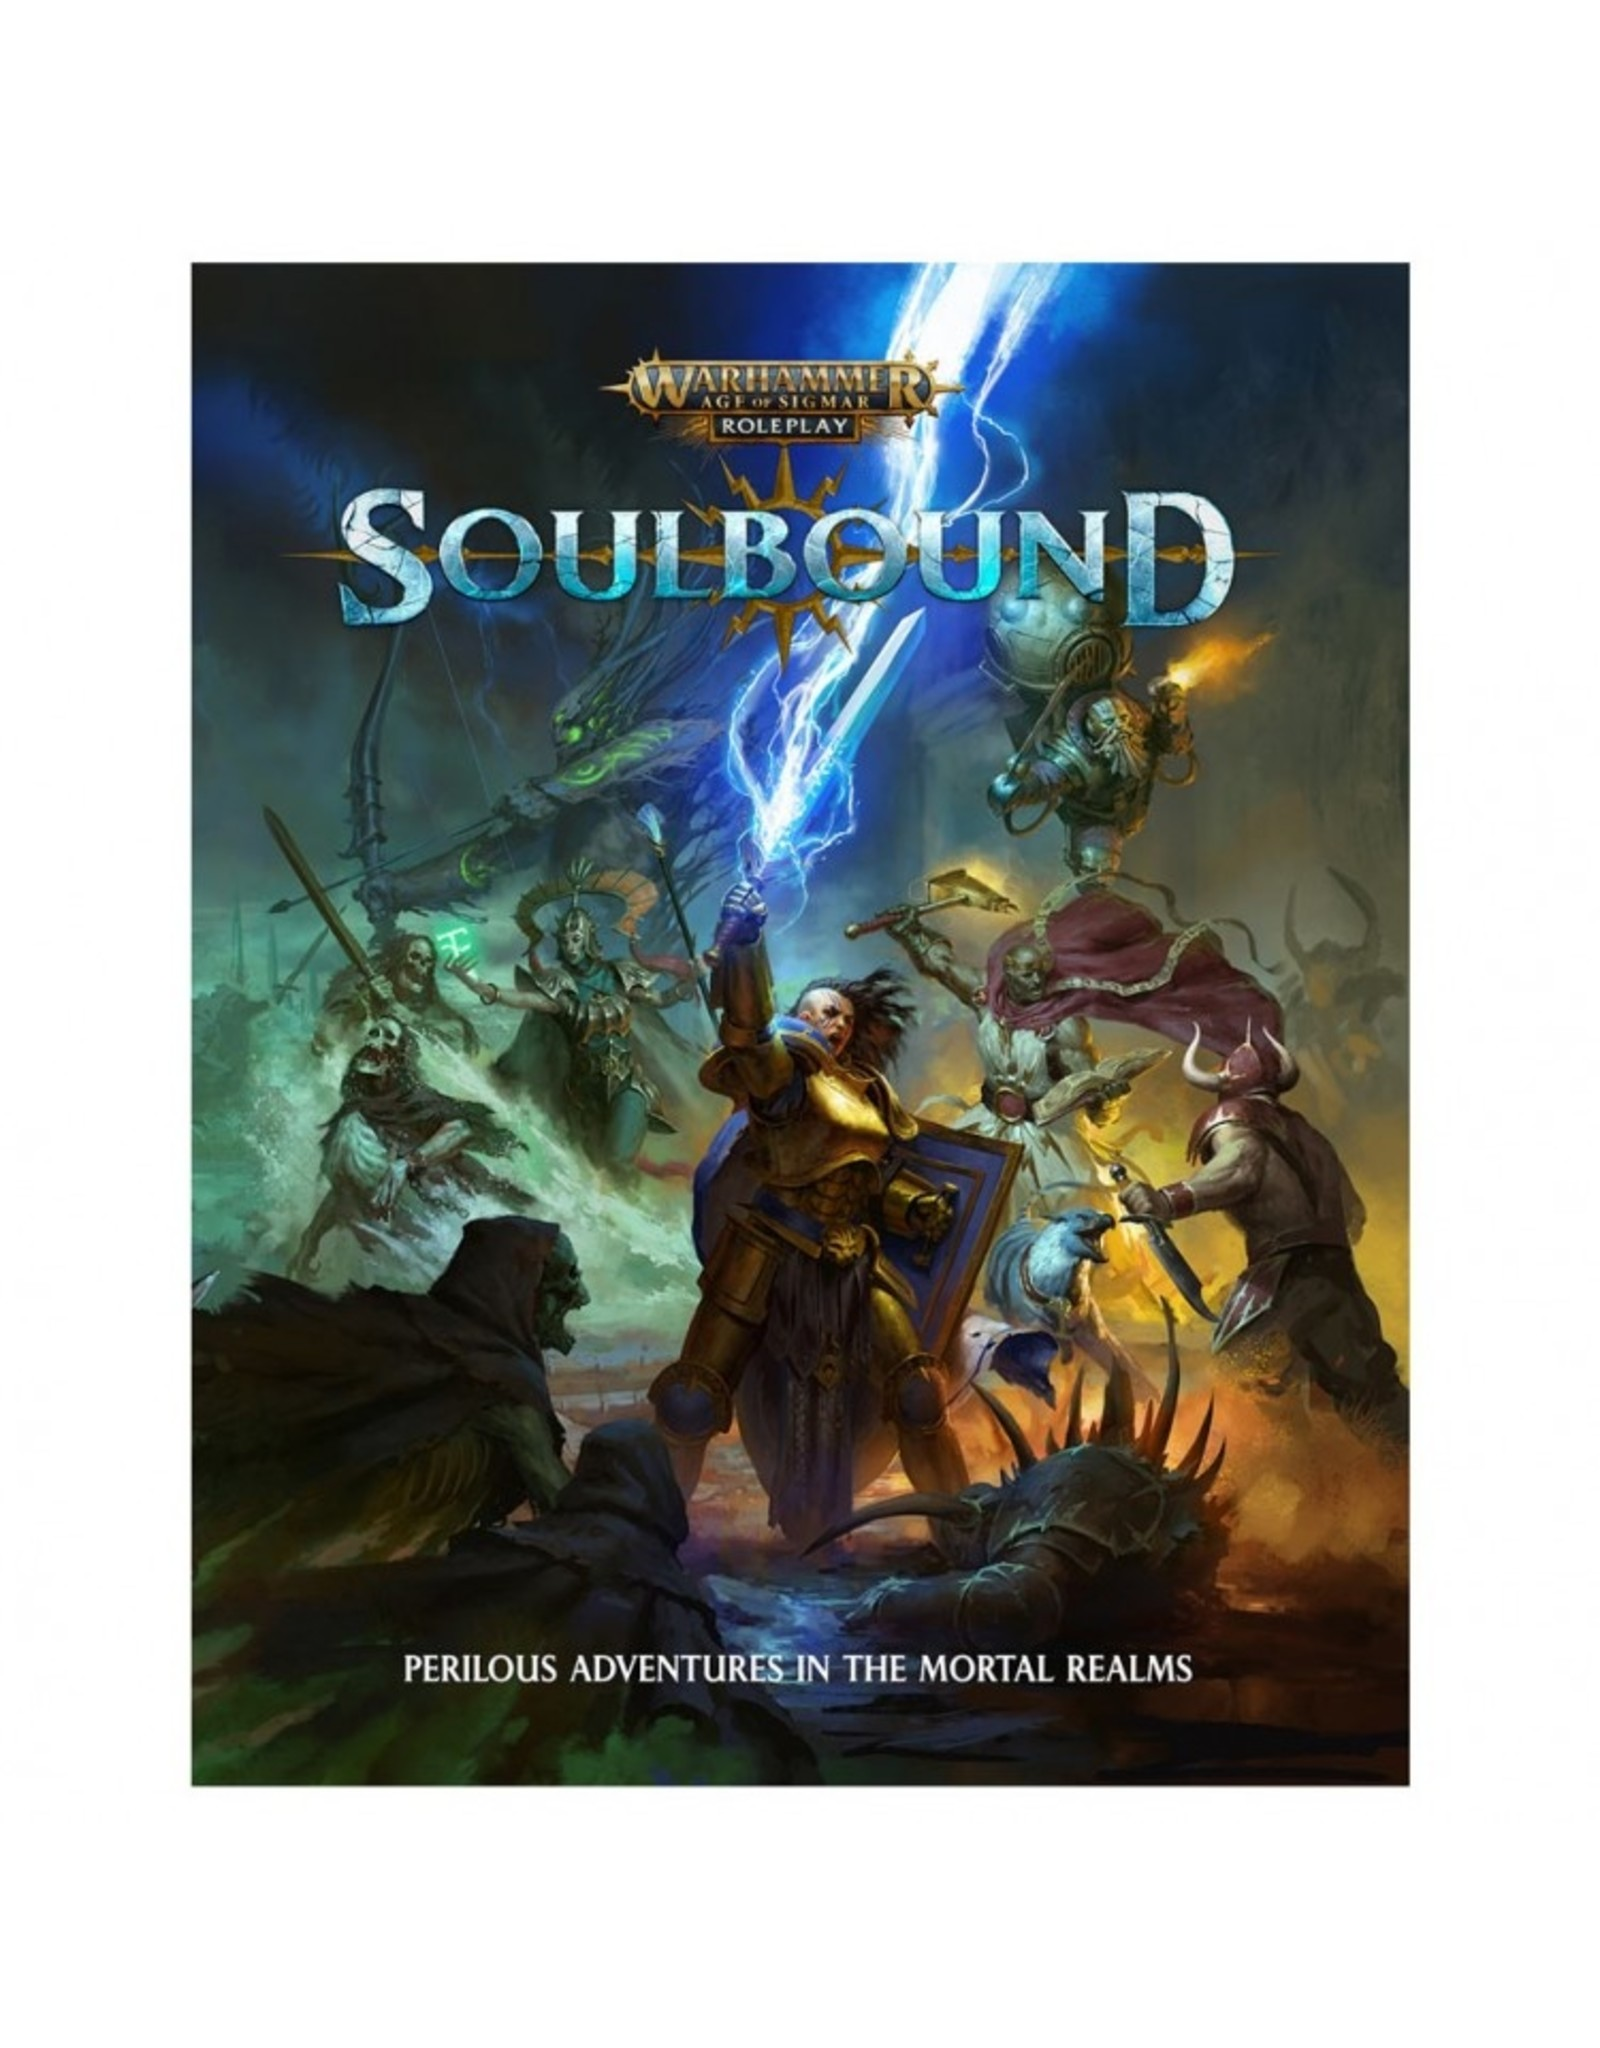 Cubicle 7 Warhammer: Age of Sigmar: Soulbound RPG (Pre Order)